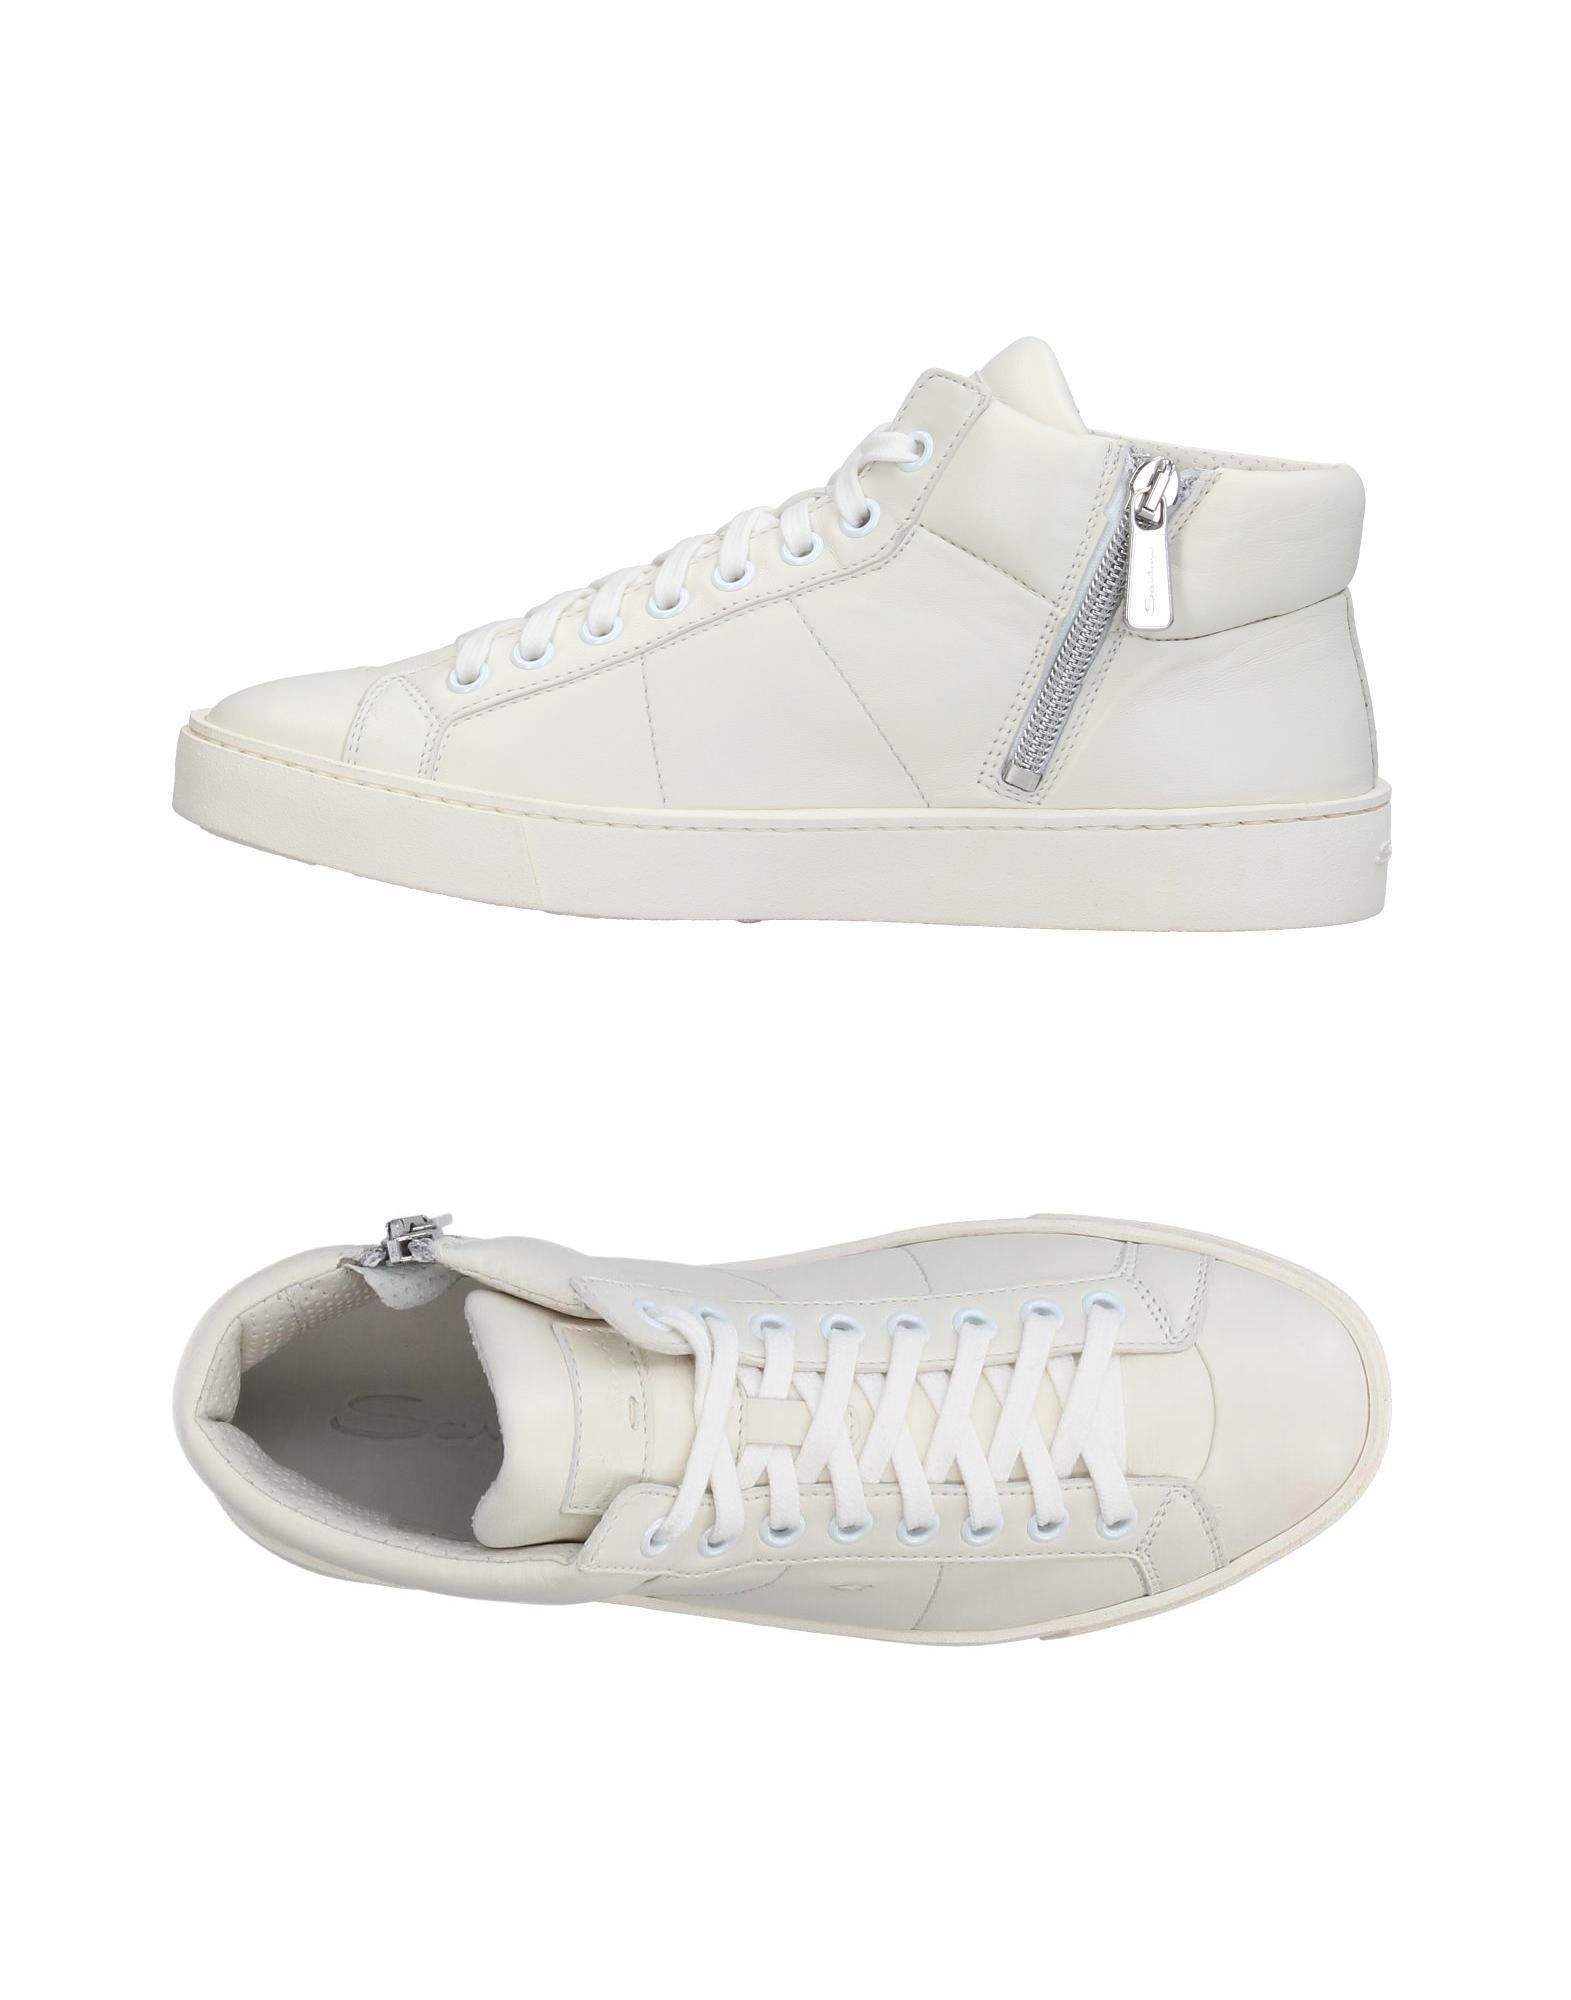 Moda Sneakers Sneakers Moda Santoni Donna - 11387511GB cebee5